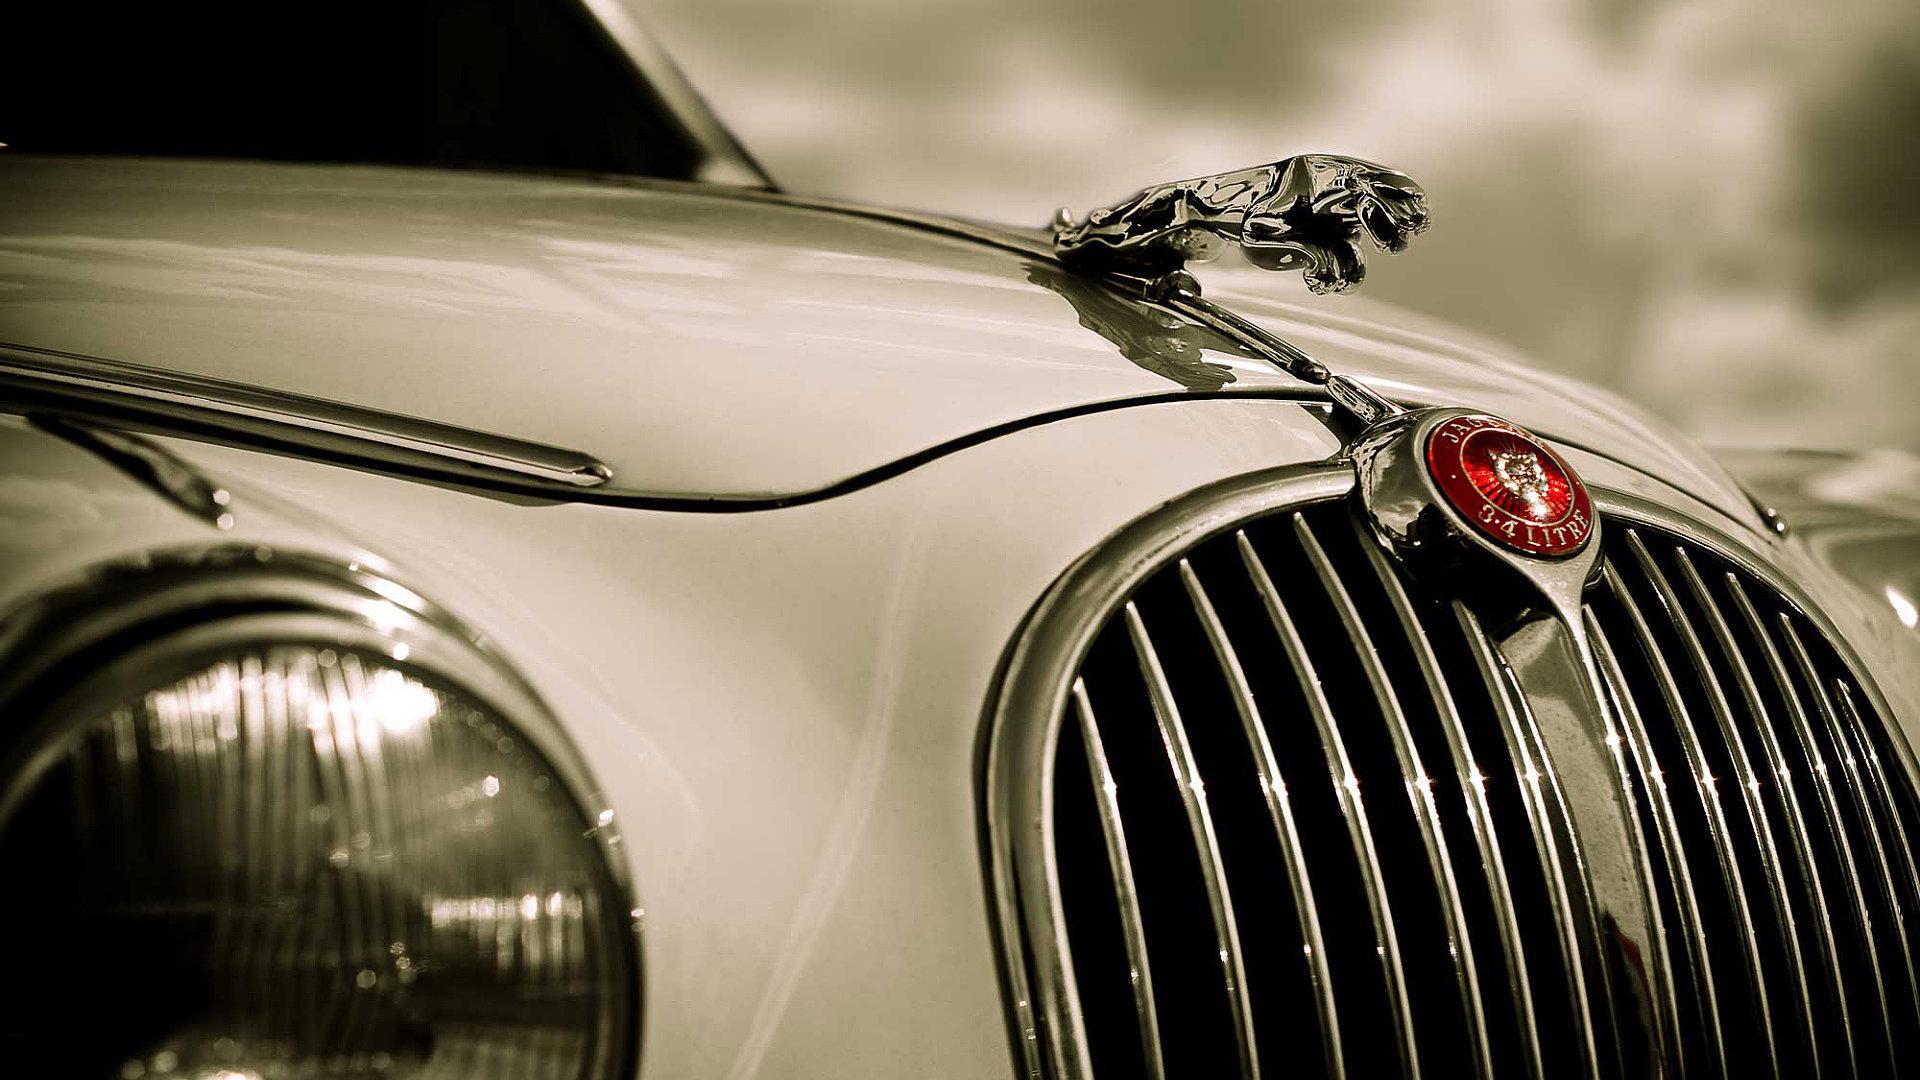 Best Jaguar Car Wallpaper Id 398153 For High Resolution Full Hd Desktop